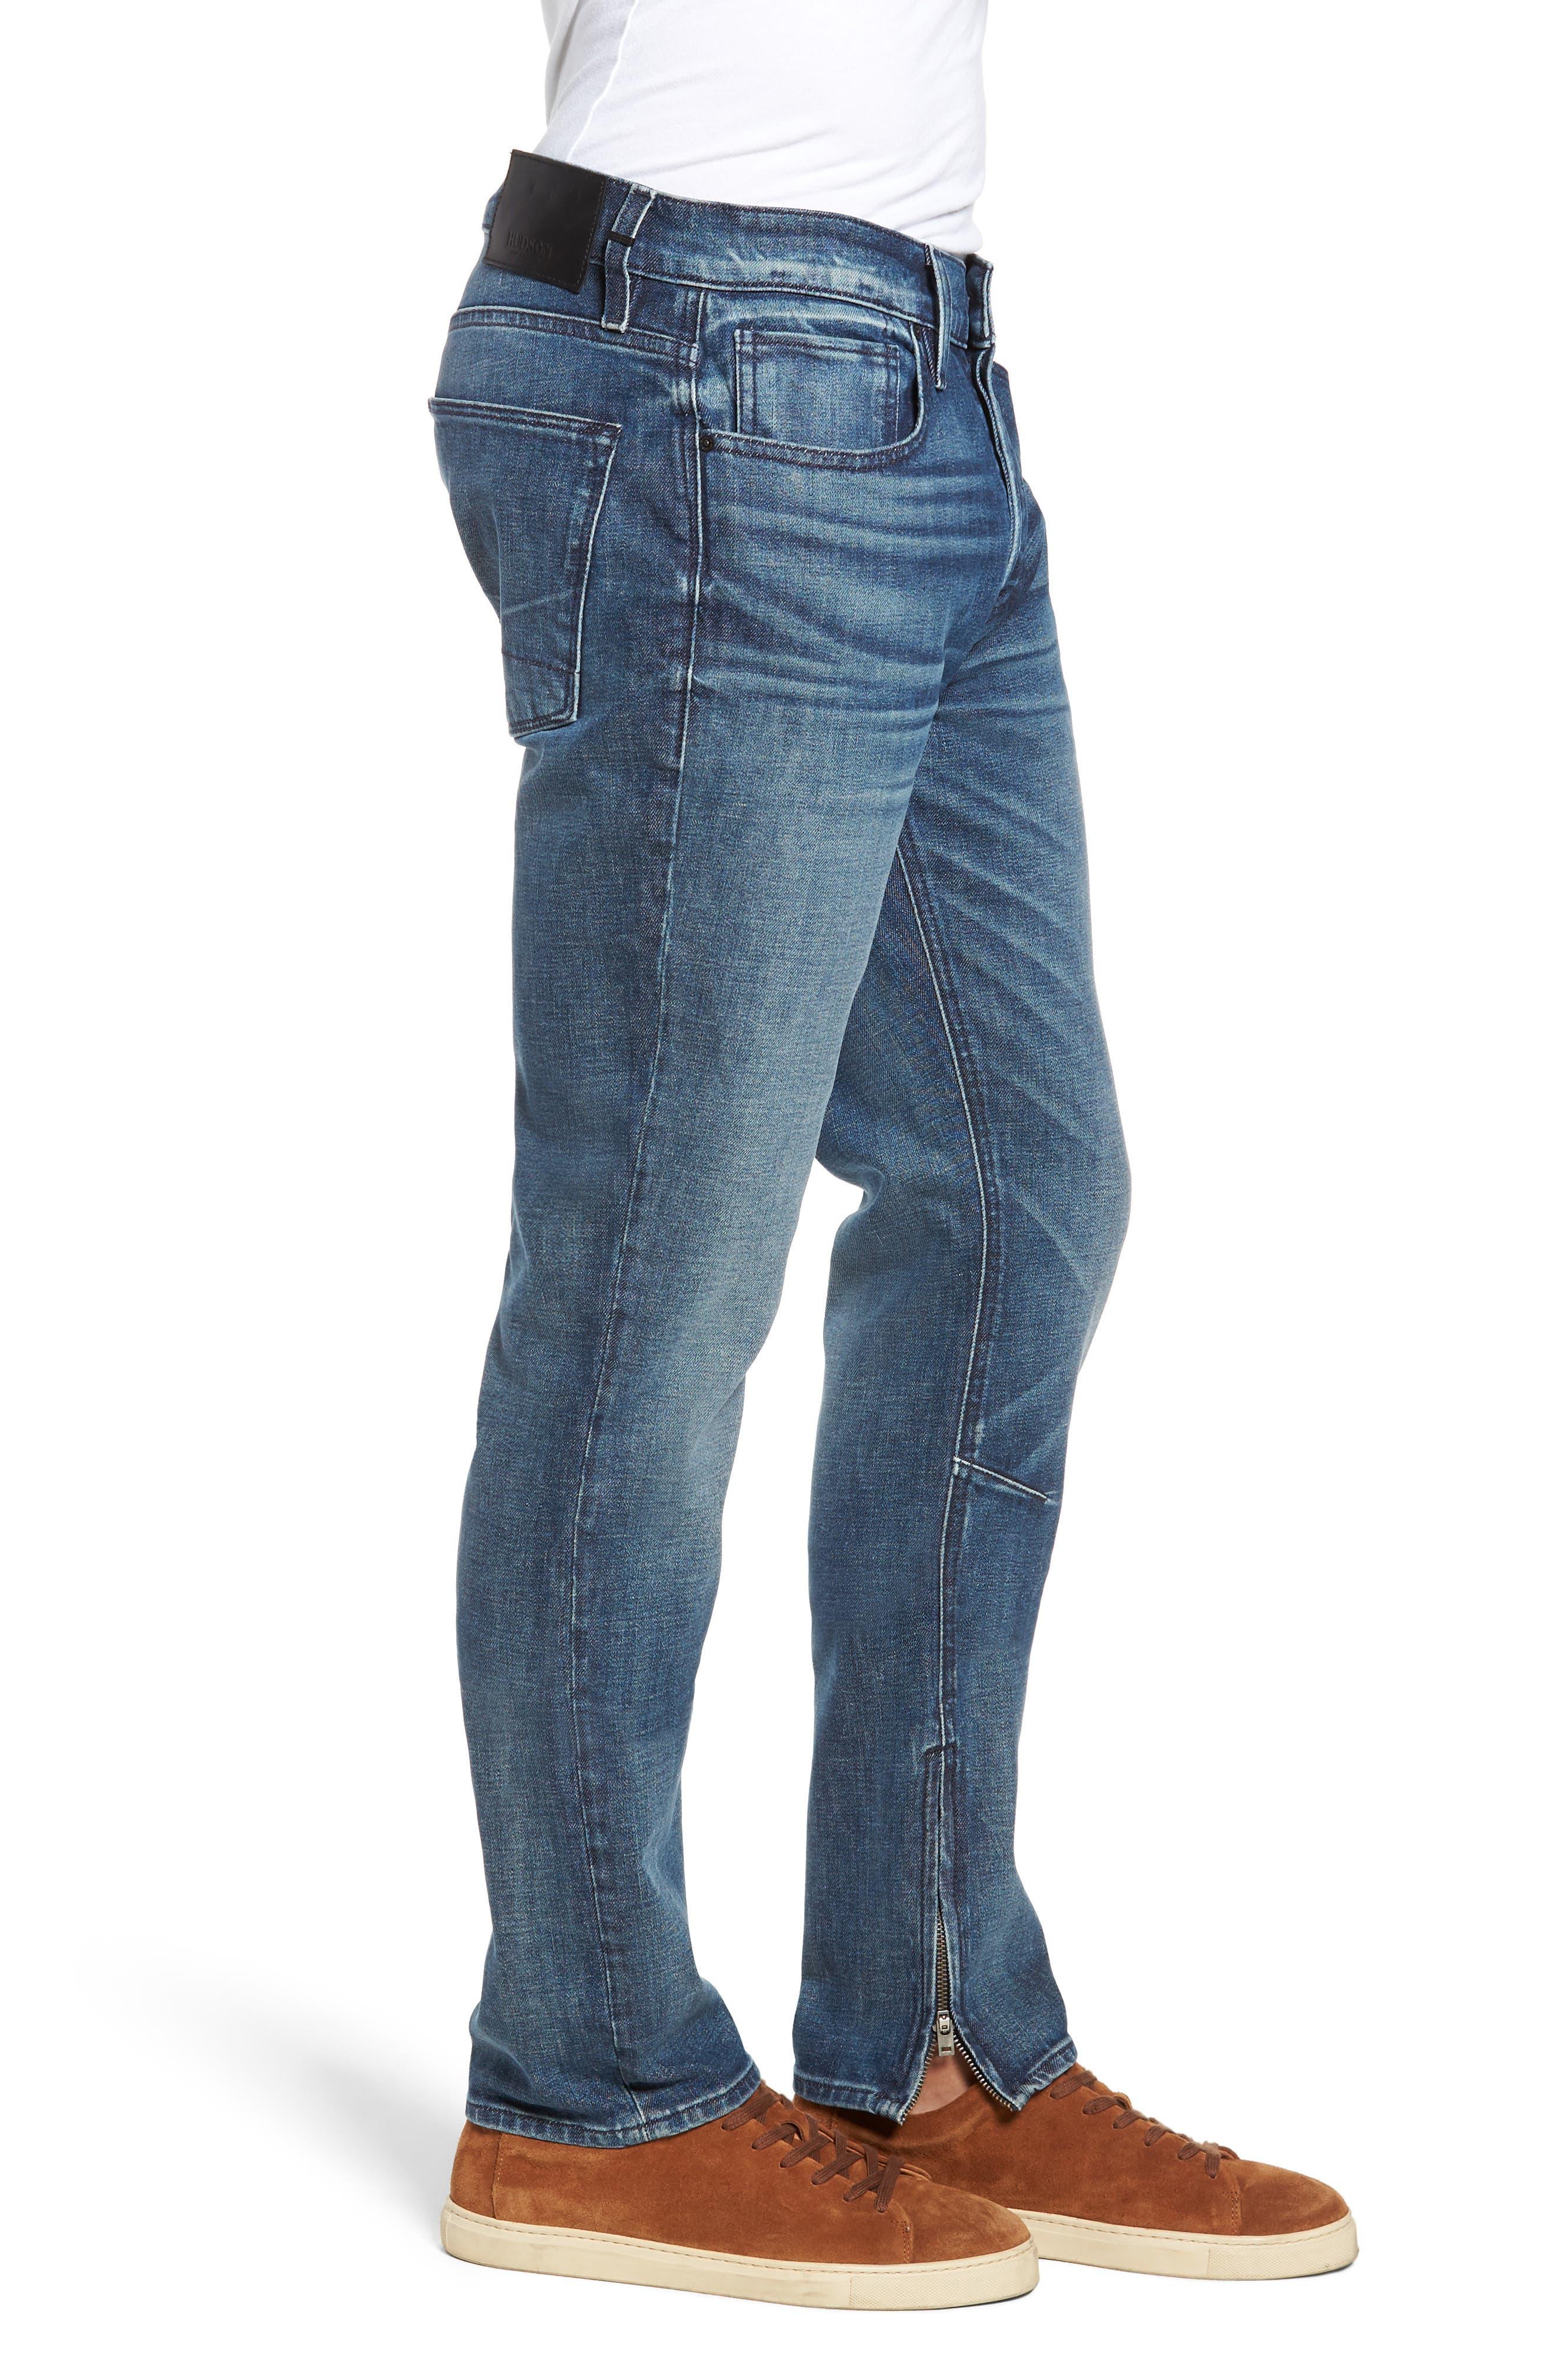 HUDSON JEANS,                             Vaughn Biker Skinny Fit Jeans,                             Alternate thumbnail 3, color,                             422